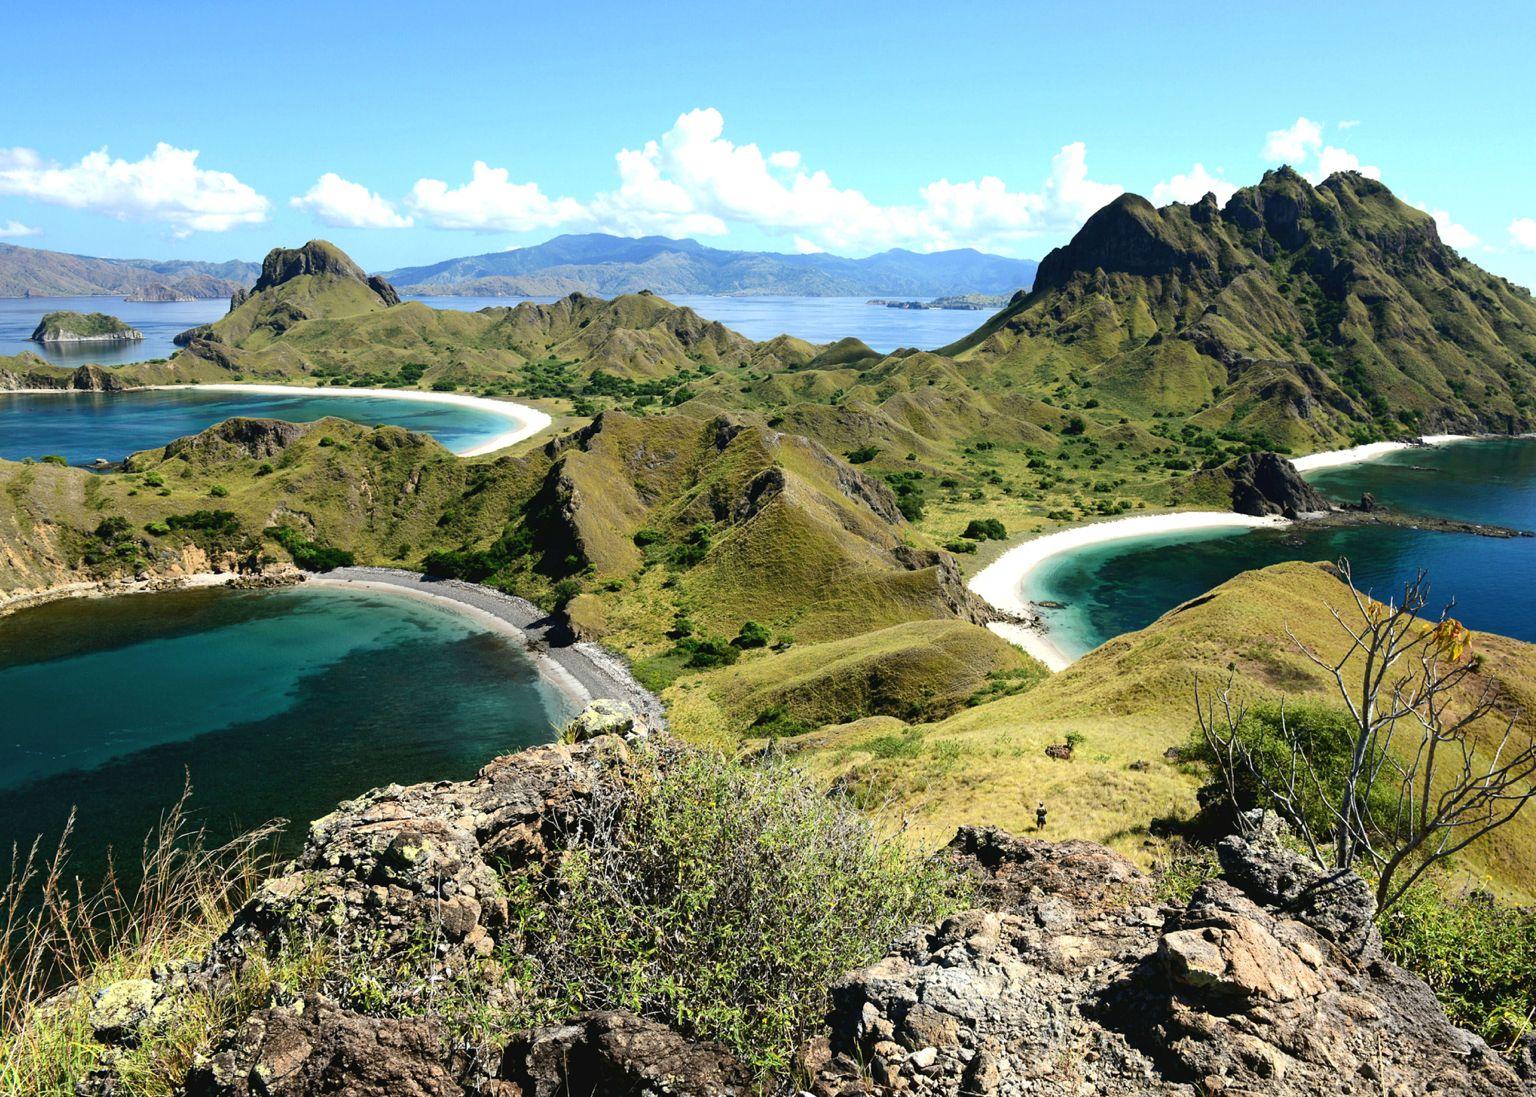 Padar-Island pulau padar, labuan bajo flores NTT Komodo ...